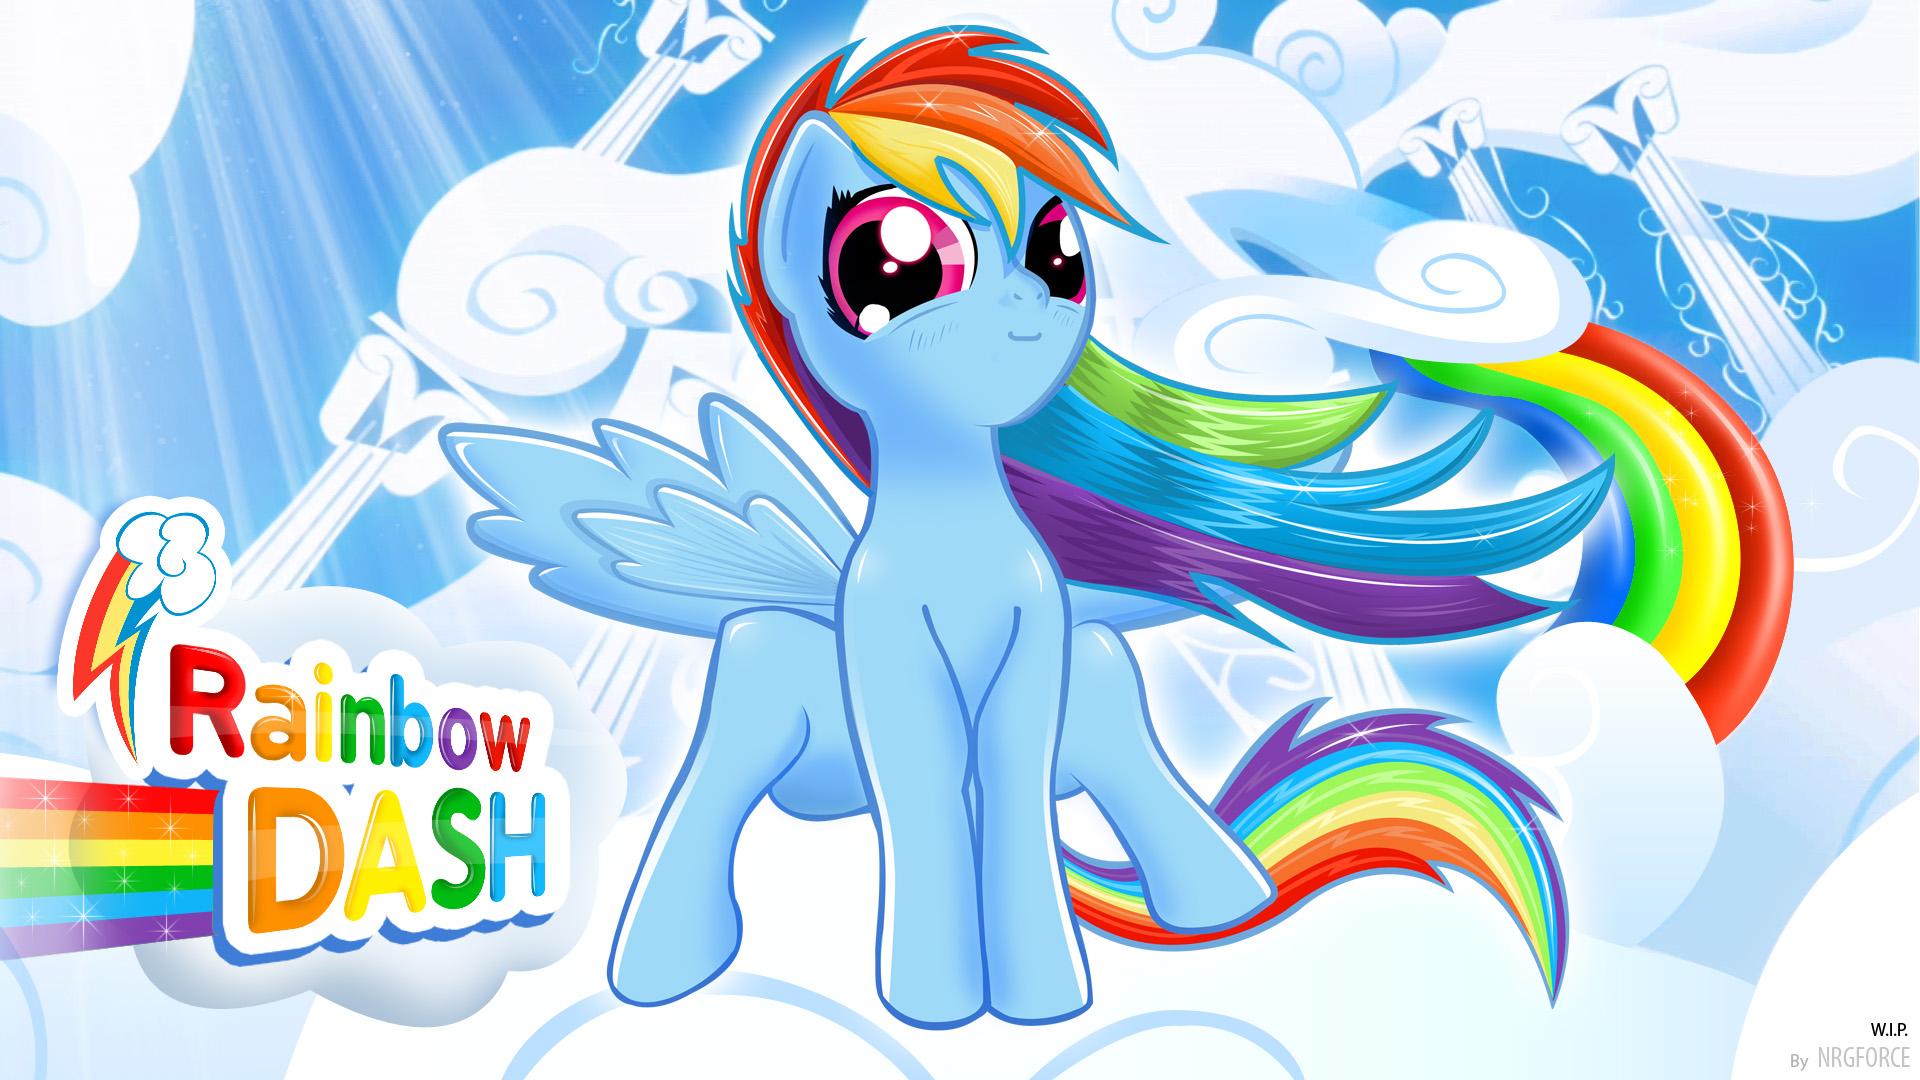 [47+] Cute Rainbow Dash Wallpaper on WallpaperSafari